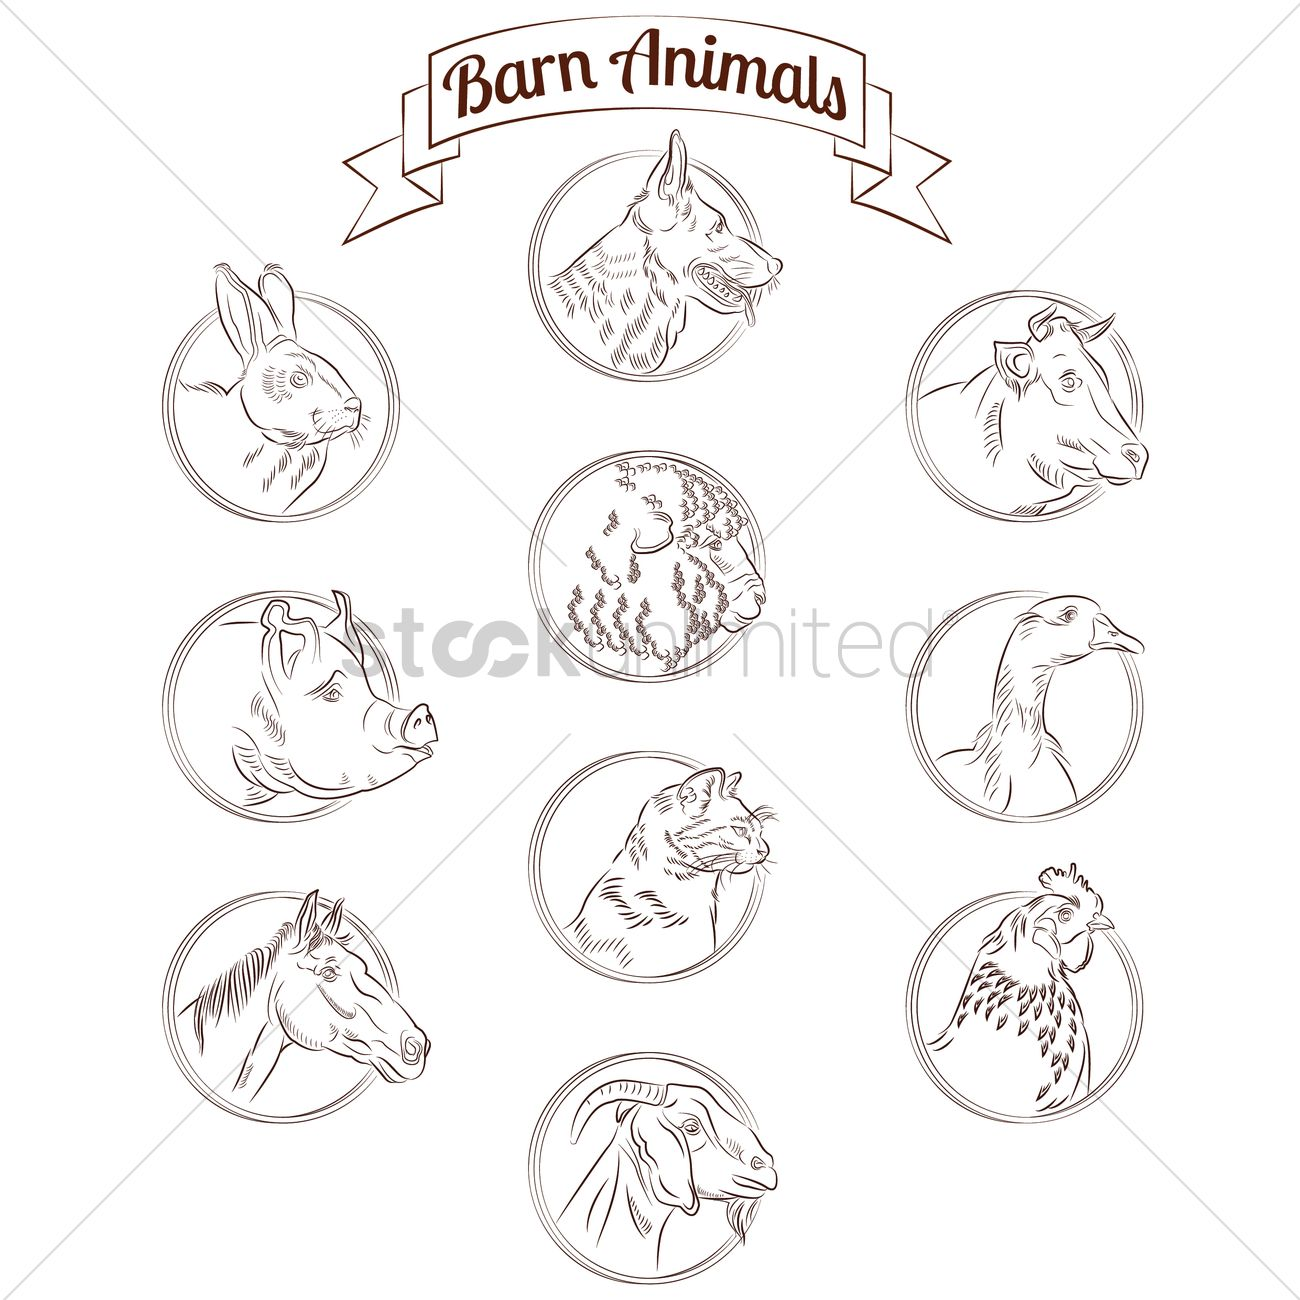 Barn Animals Set Vector Graphic